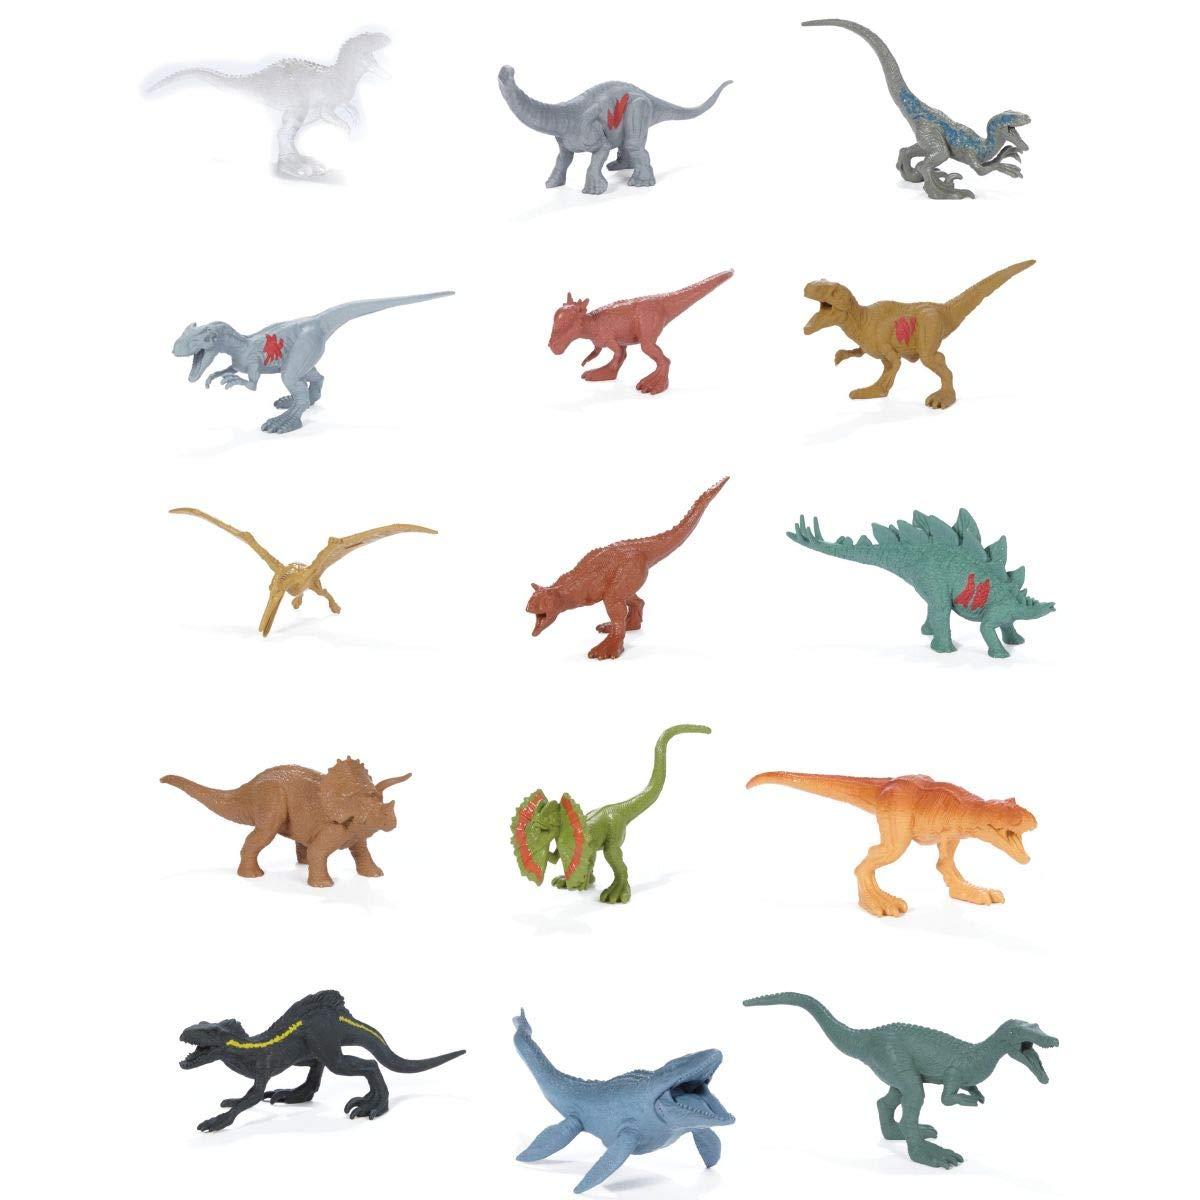 Jurassic World Fallen Kingdom Mini Dino Multipack 15 Pack Battle Damage.: Amazon.es: Juguetes y juegos